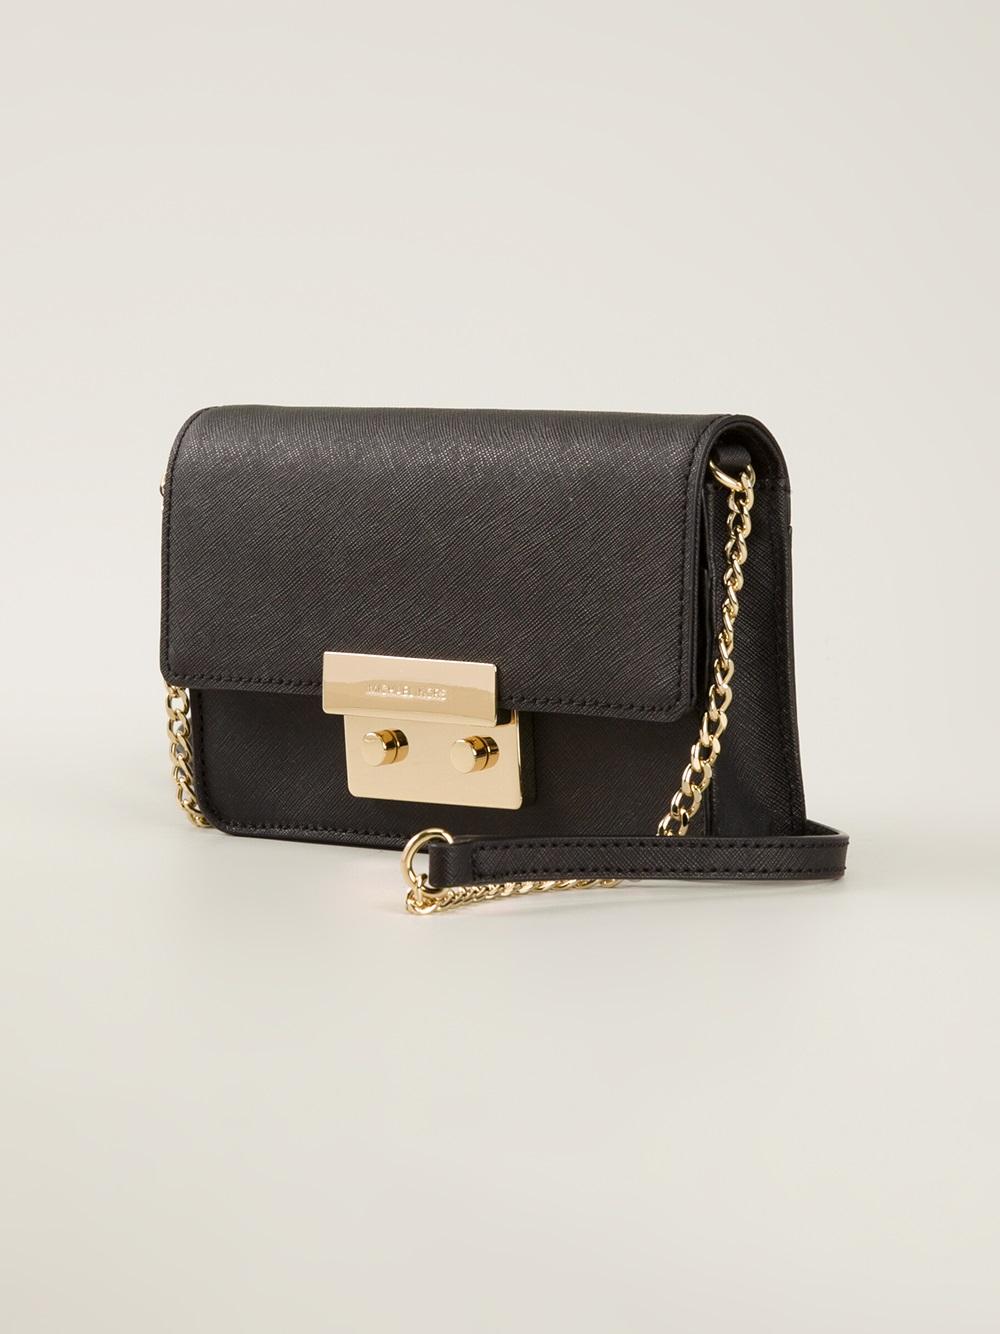 Michael kors bags black and gold